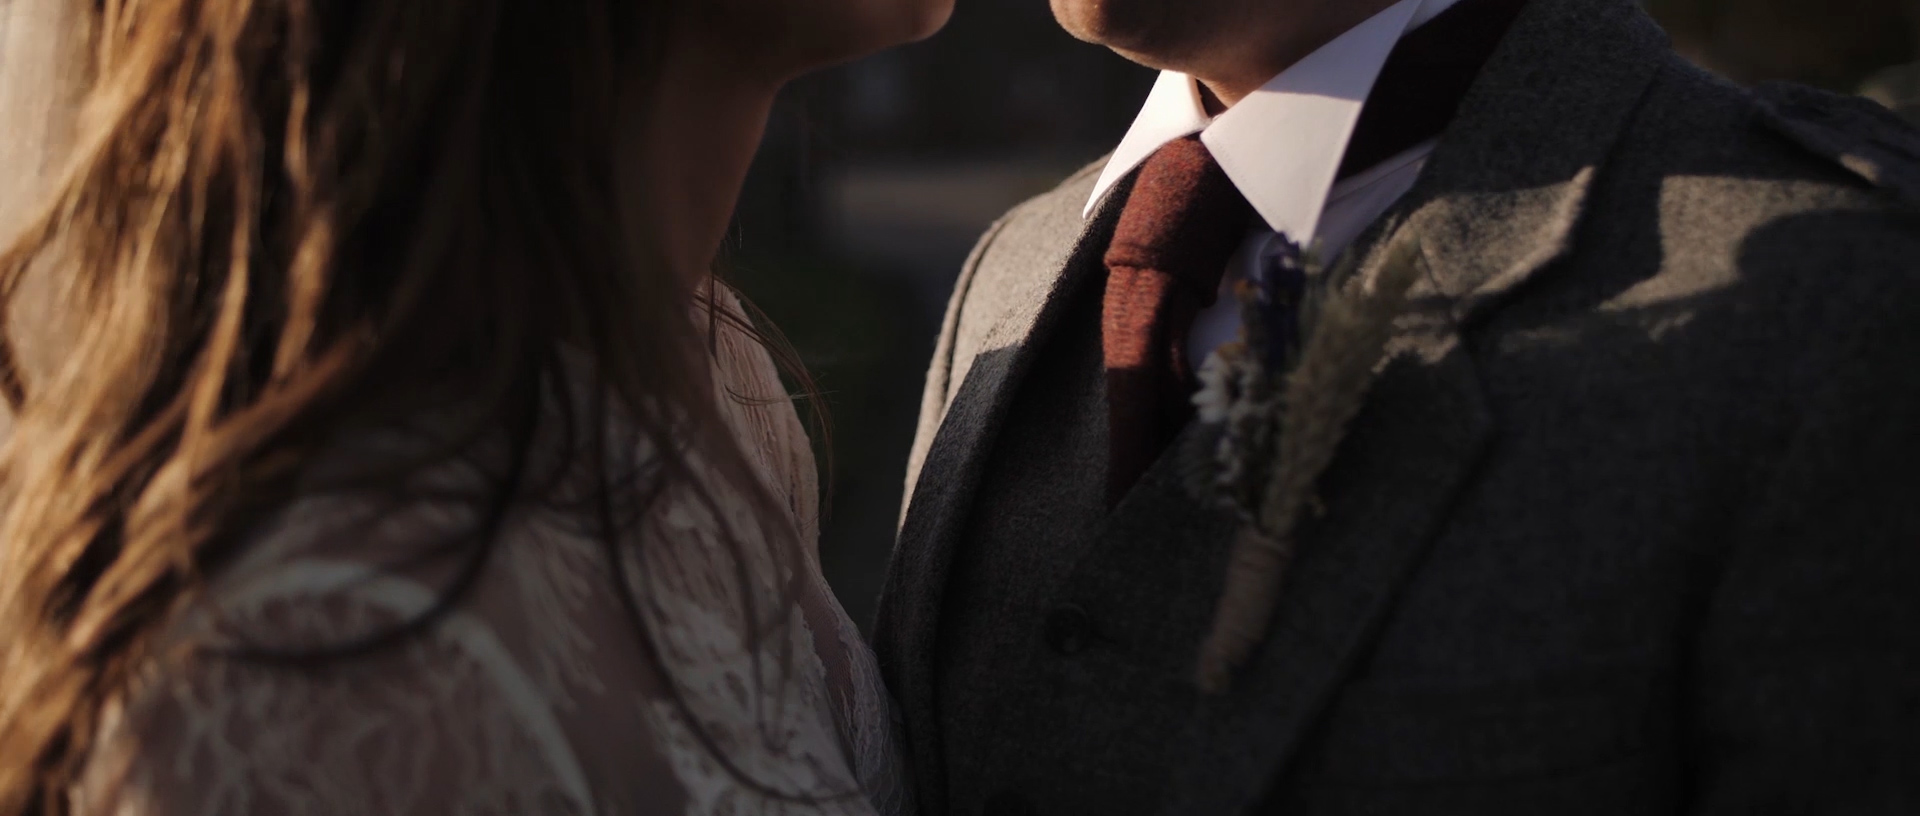 the-glue-factory-wedding-videographer_LL_04.jpg